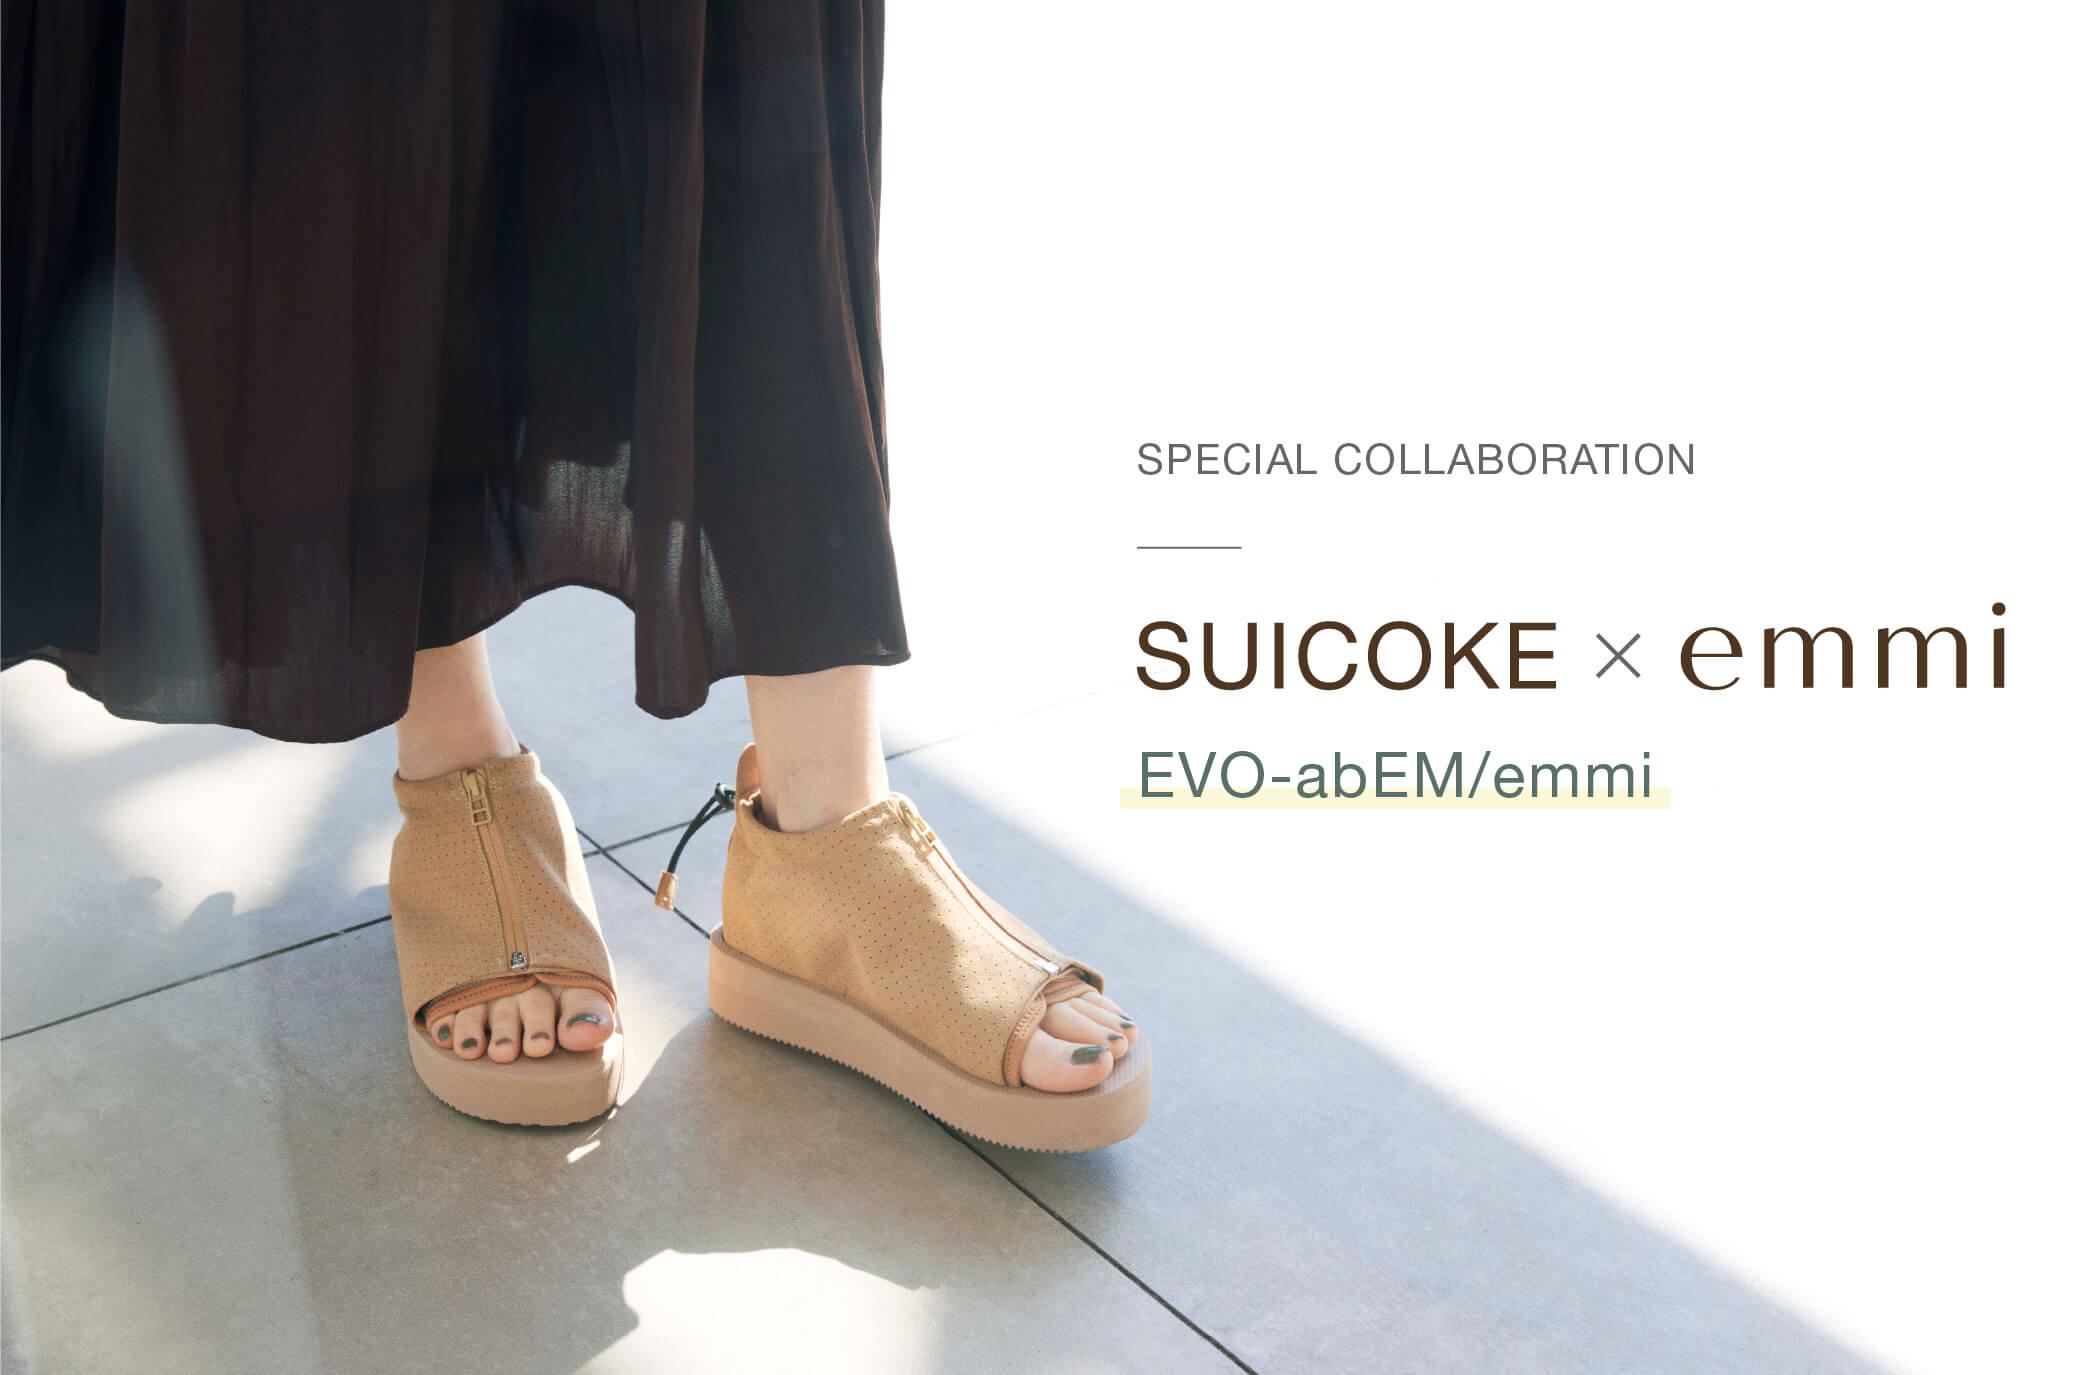 SPECIAL COLLABORATION SUICOKE × emmi EVO-abEM/emmi